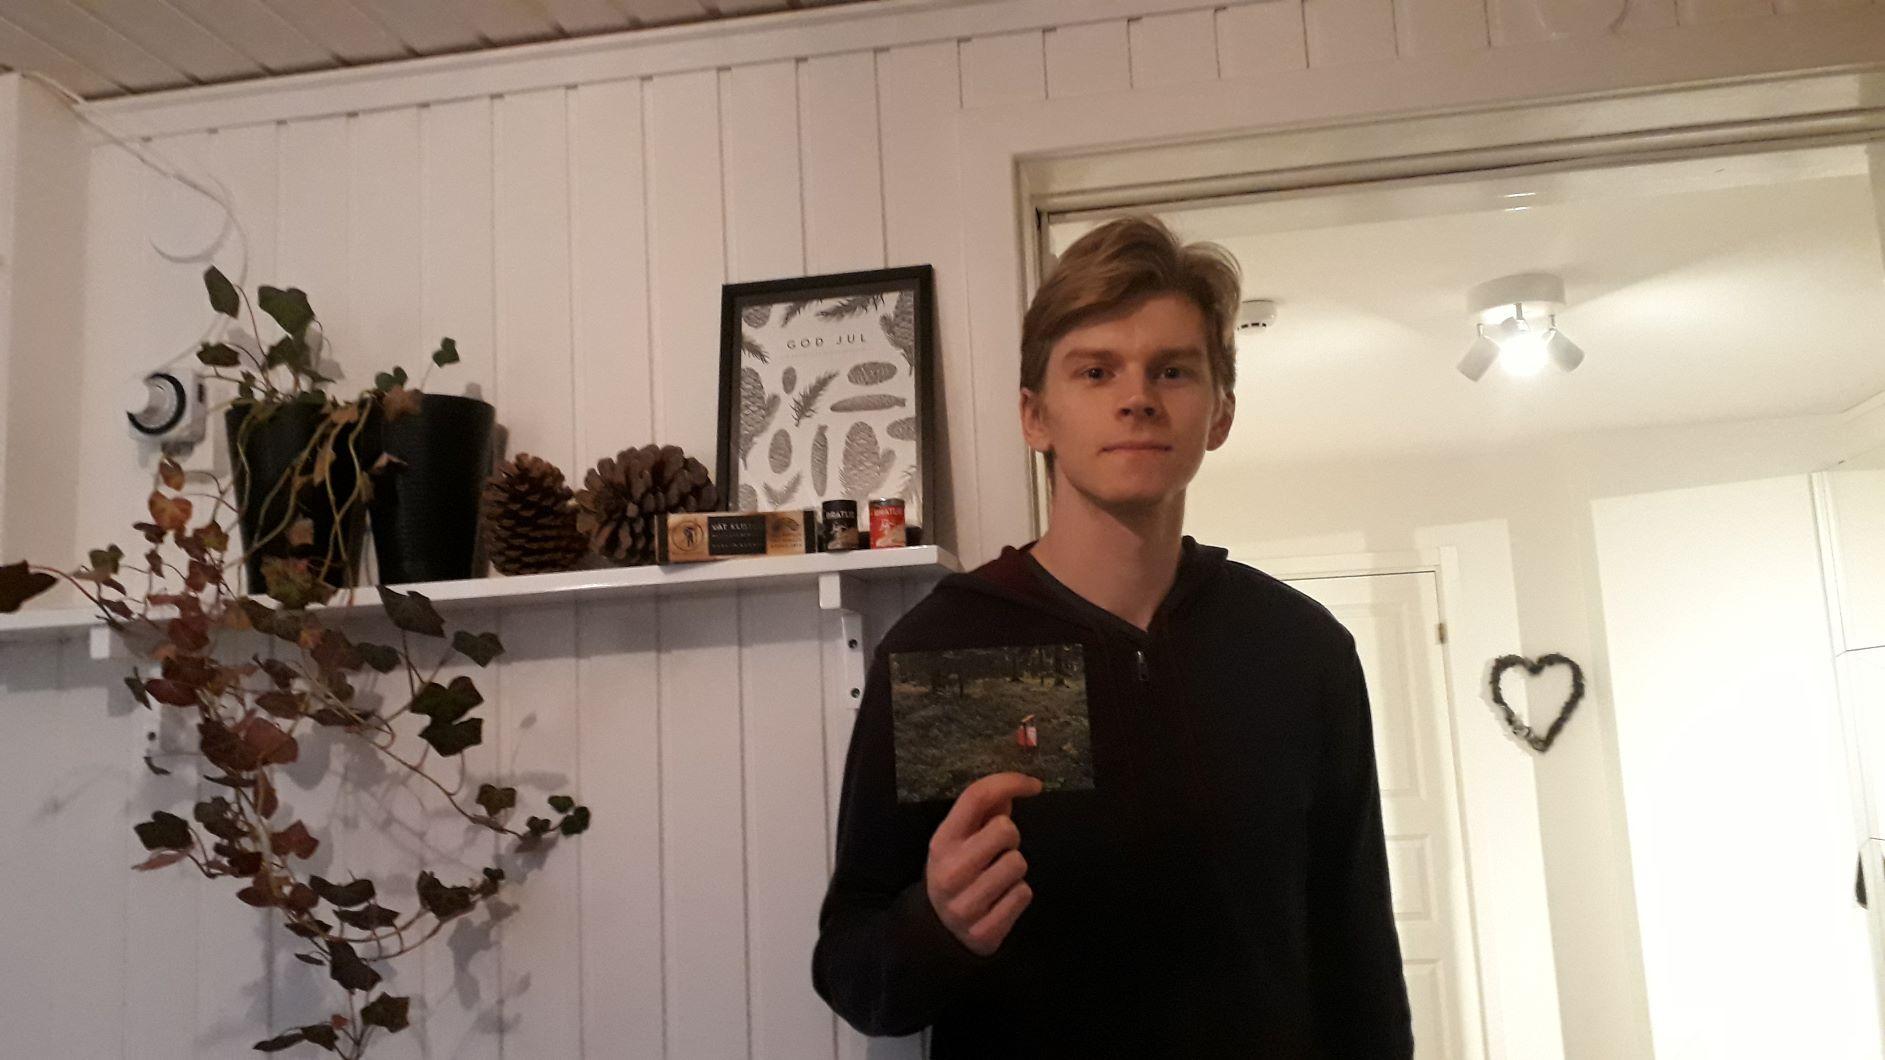 Årets segrare Ville Johansson